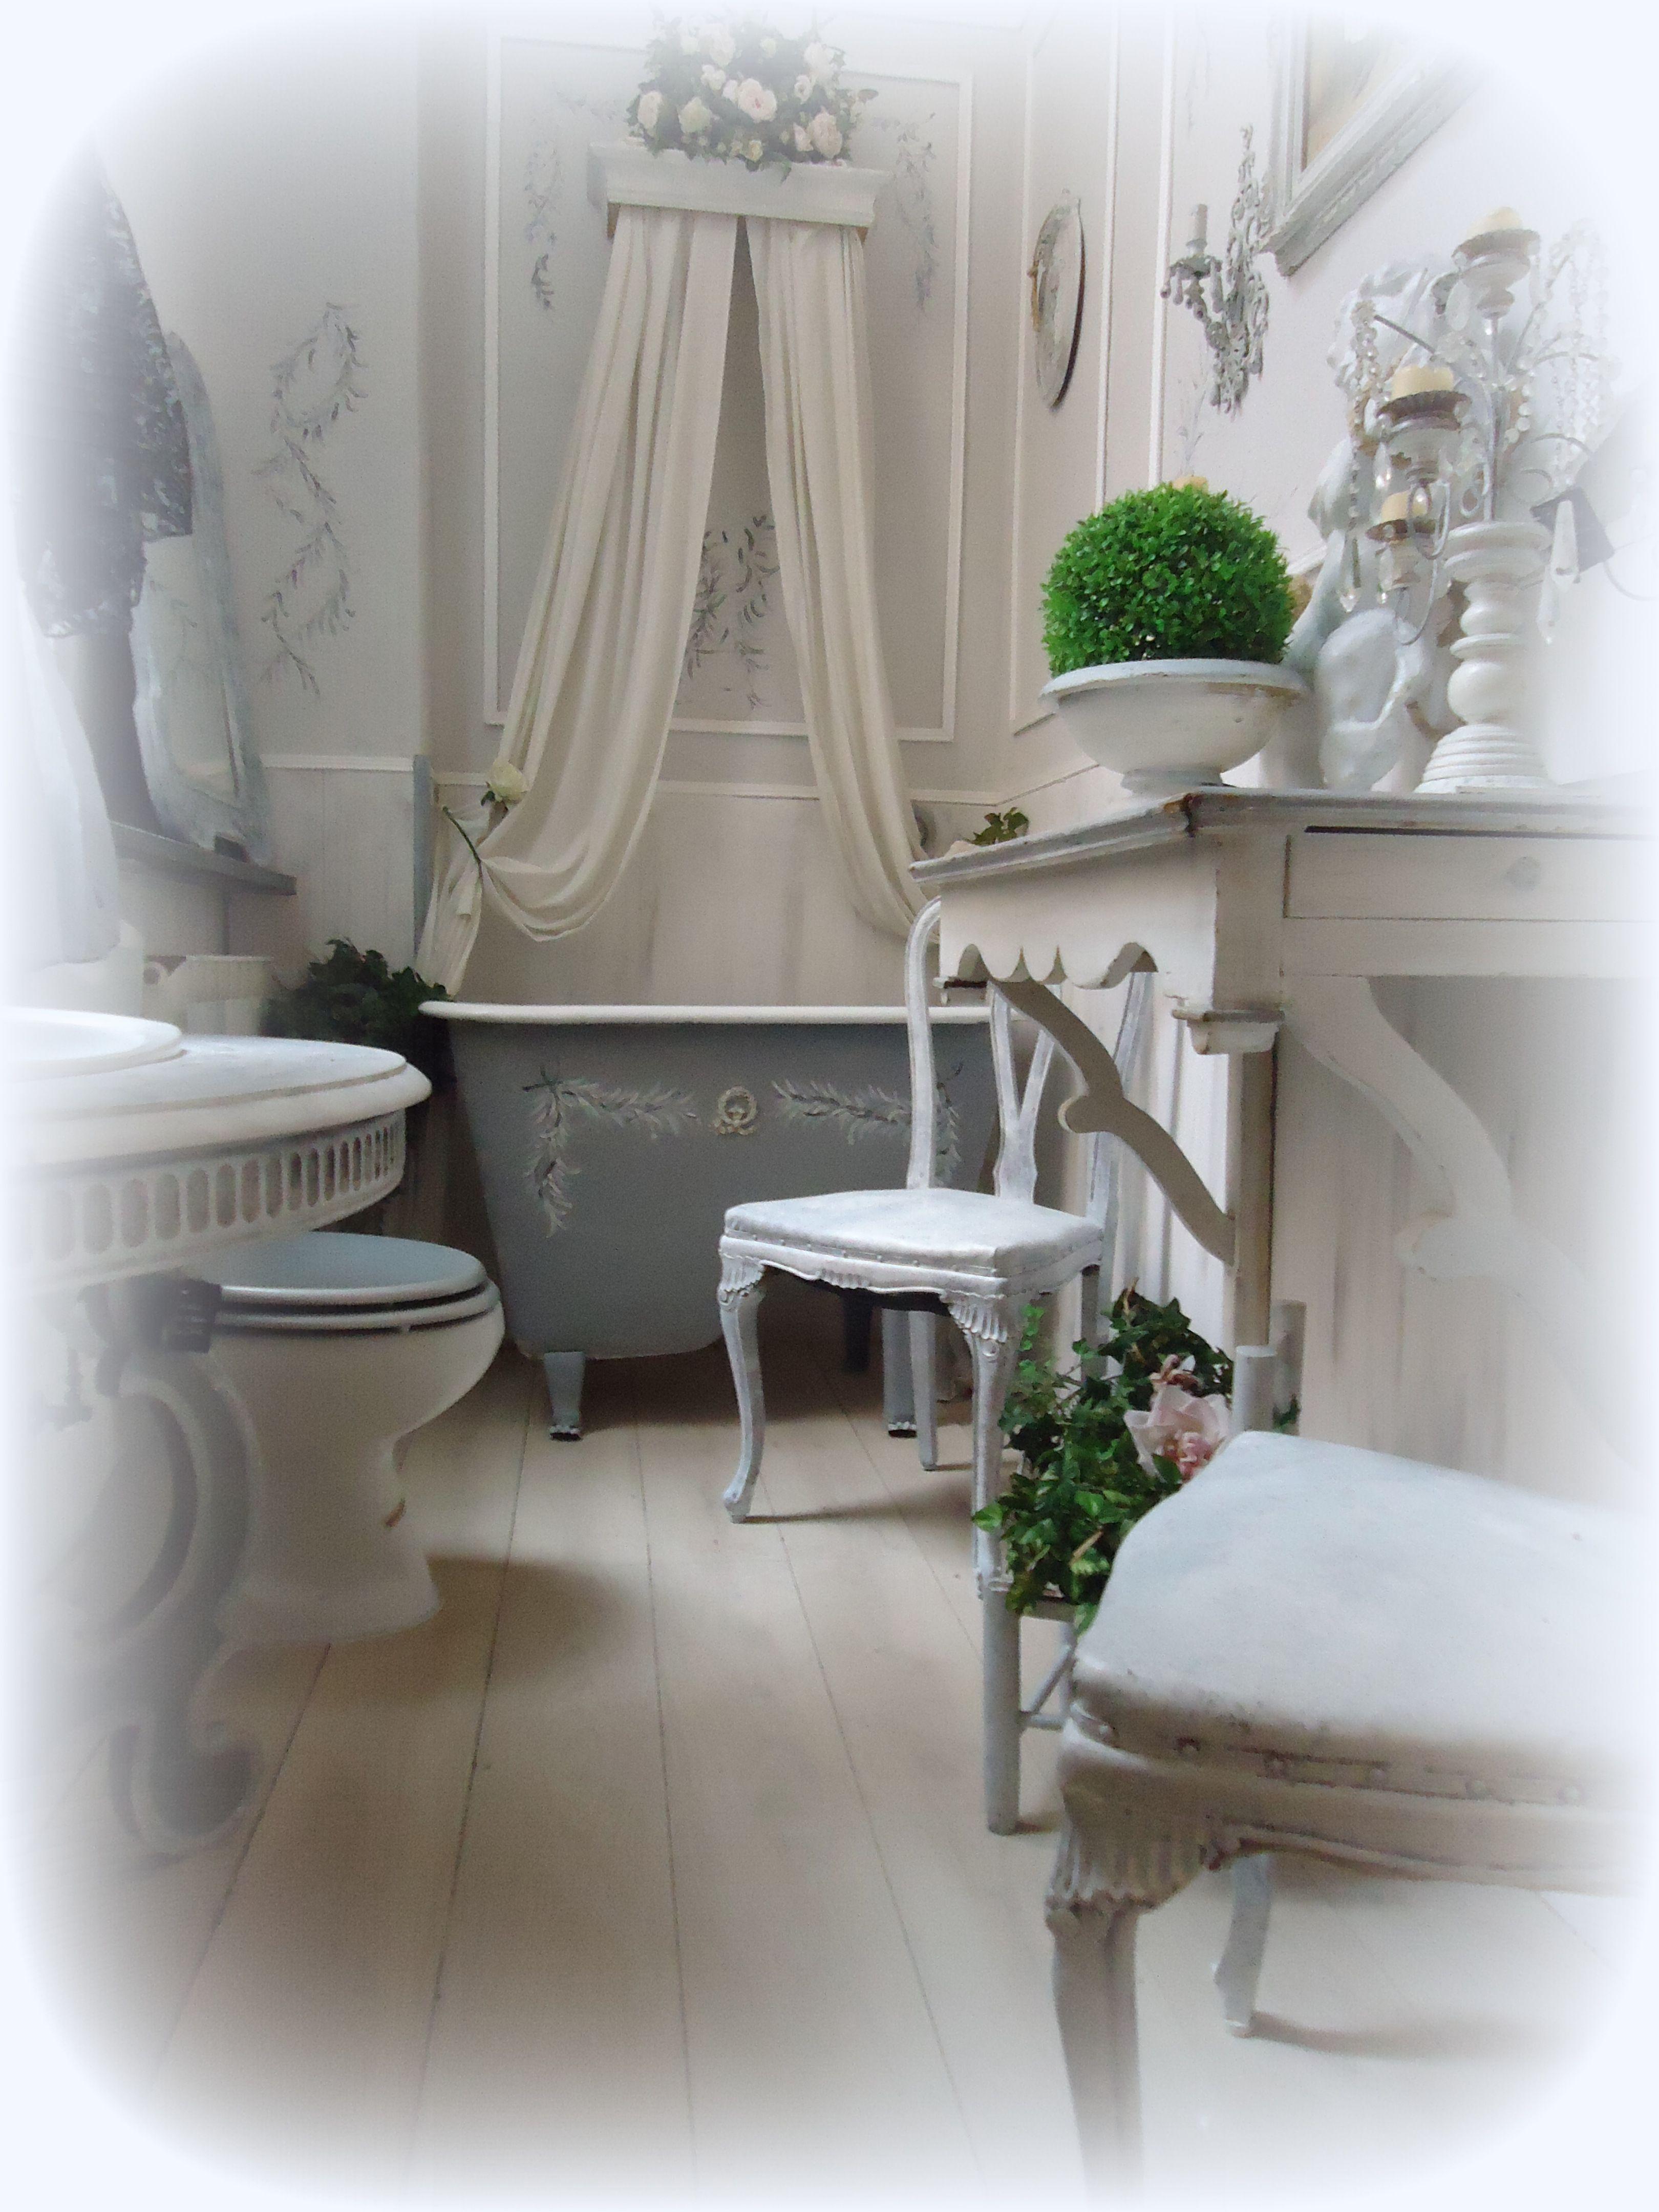 the bathroom gustavien style gustavien pinterest thàs style